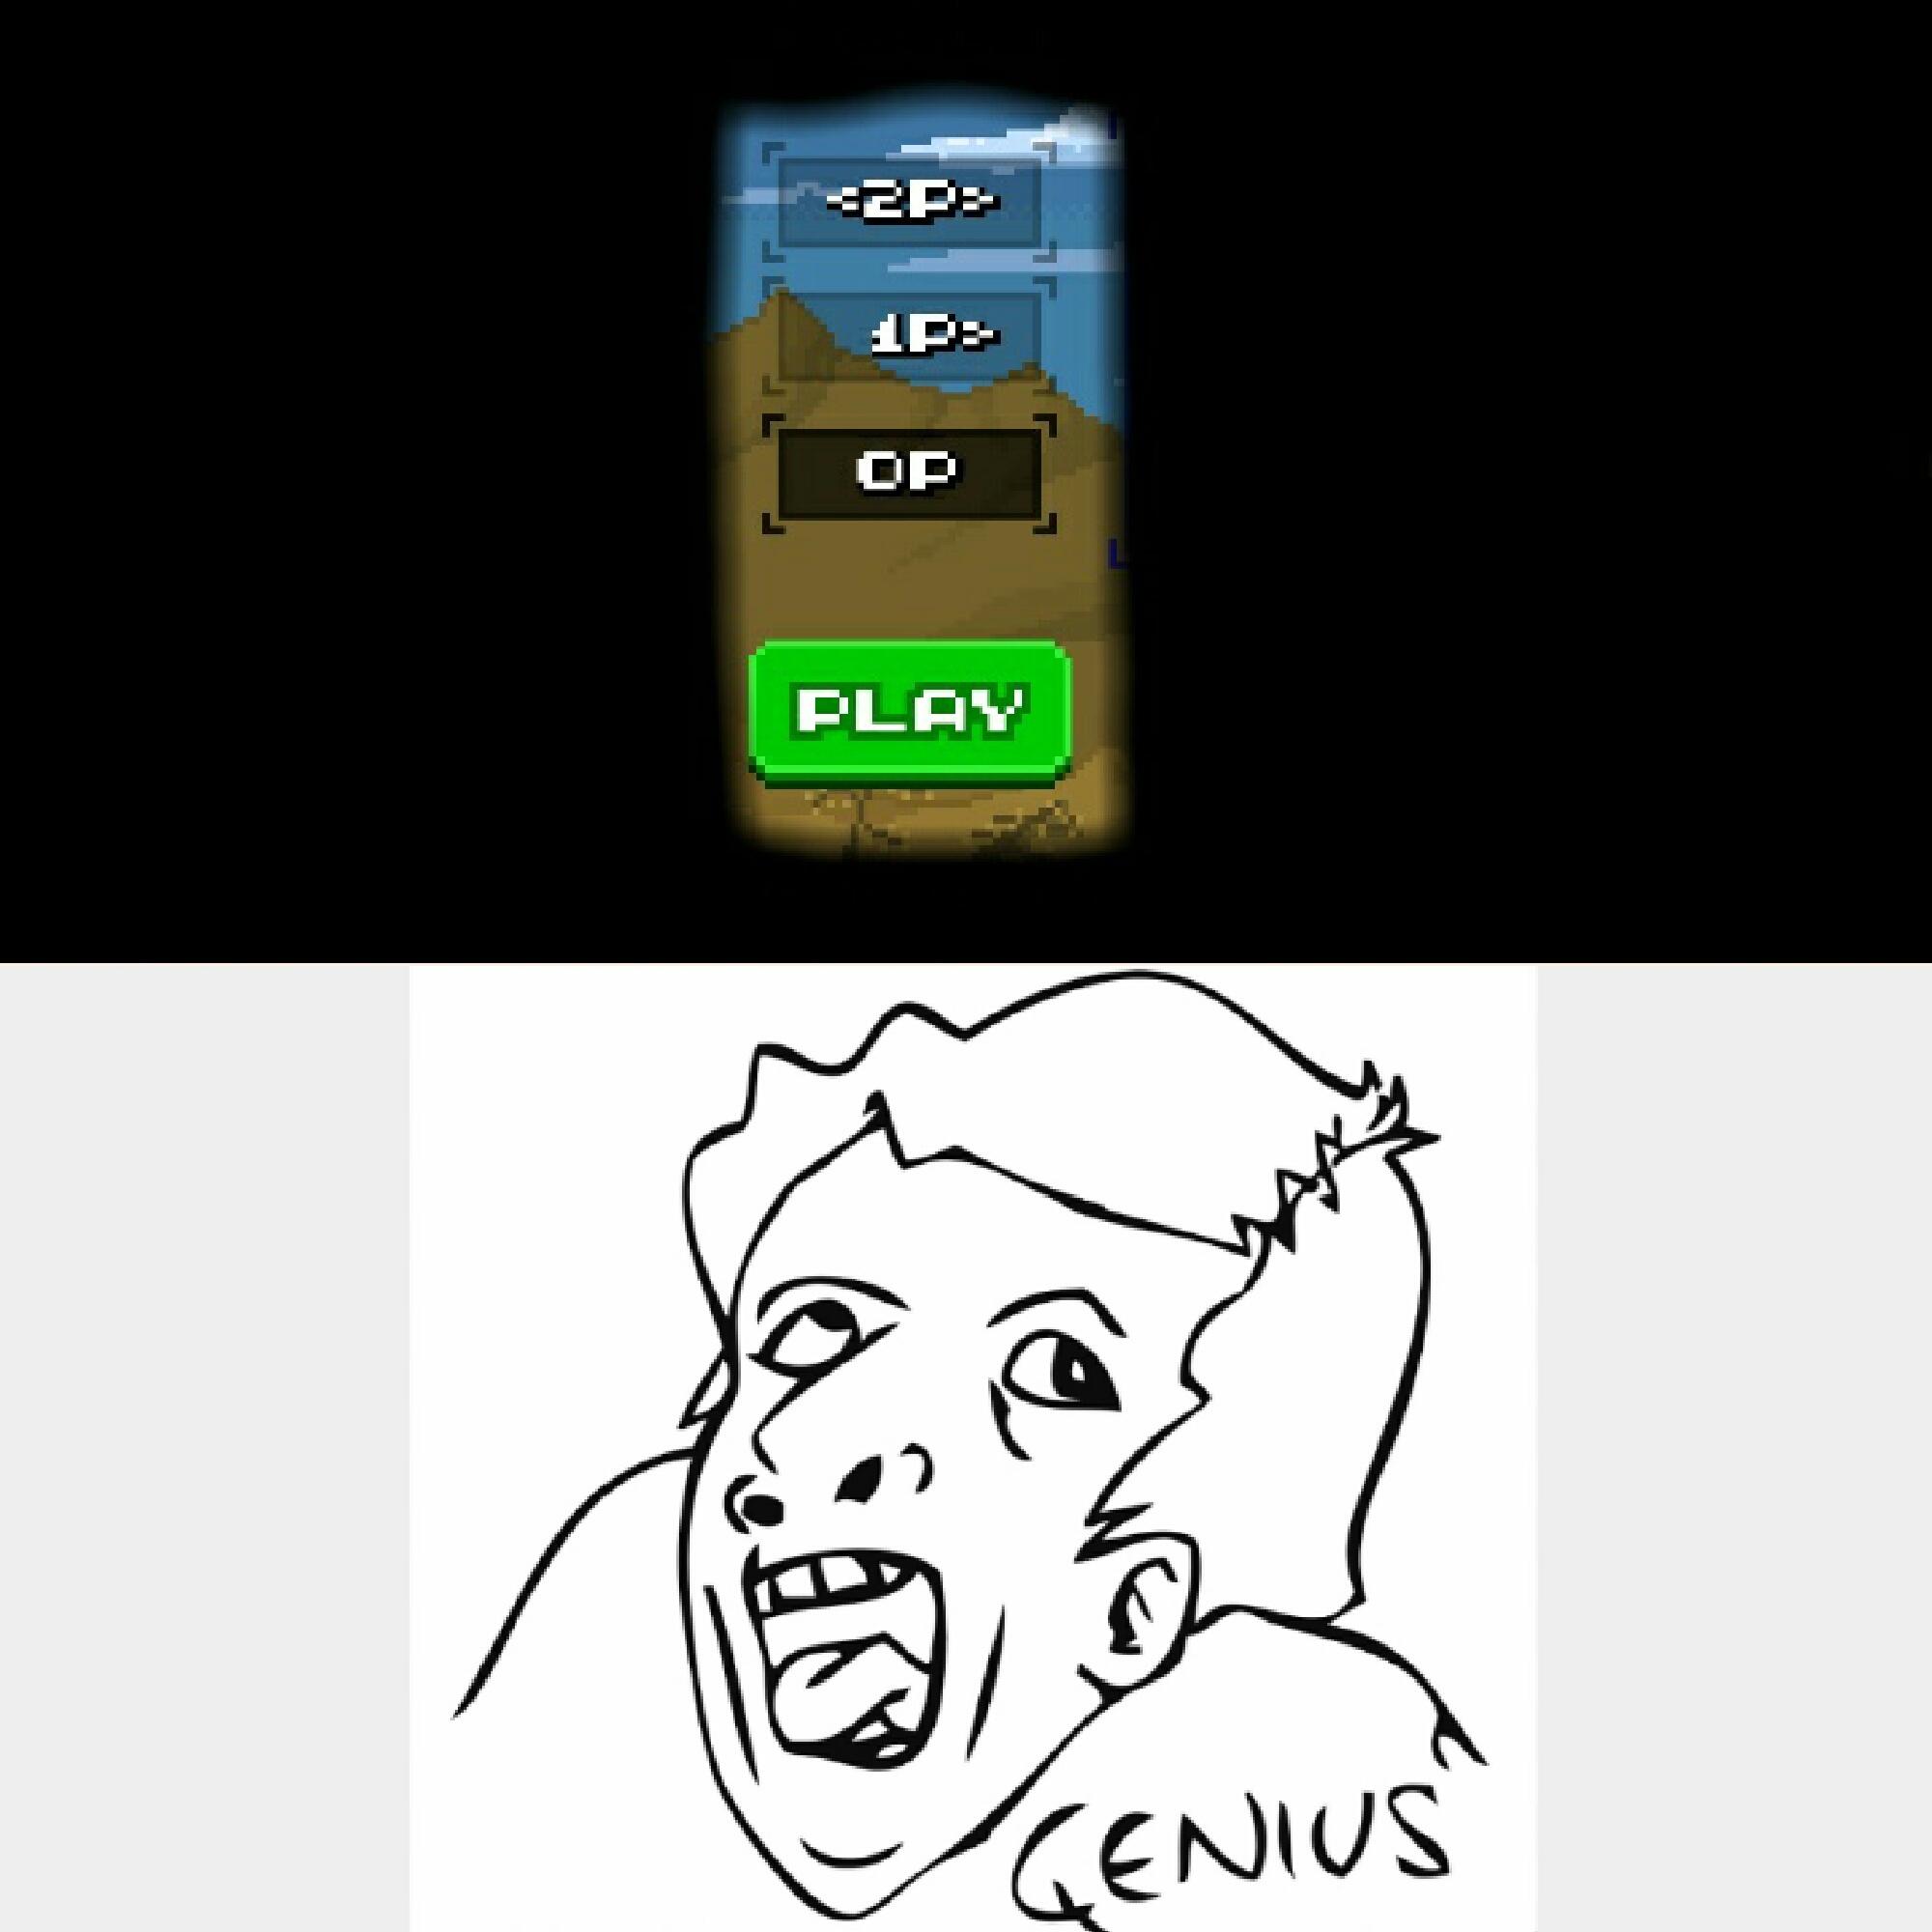 0 player... whaaat - meme